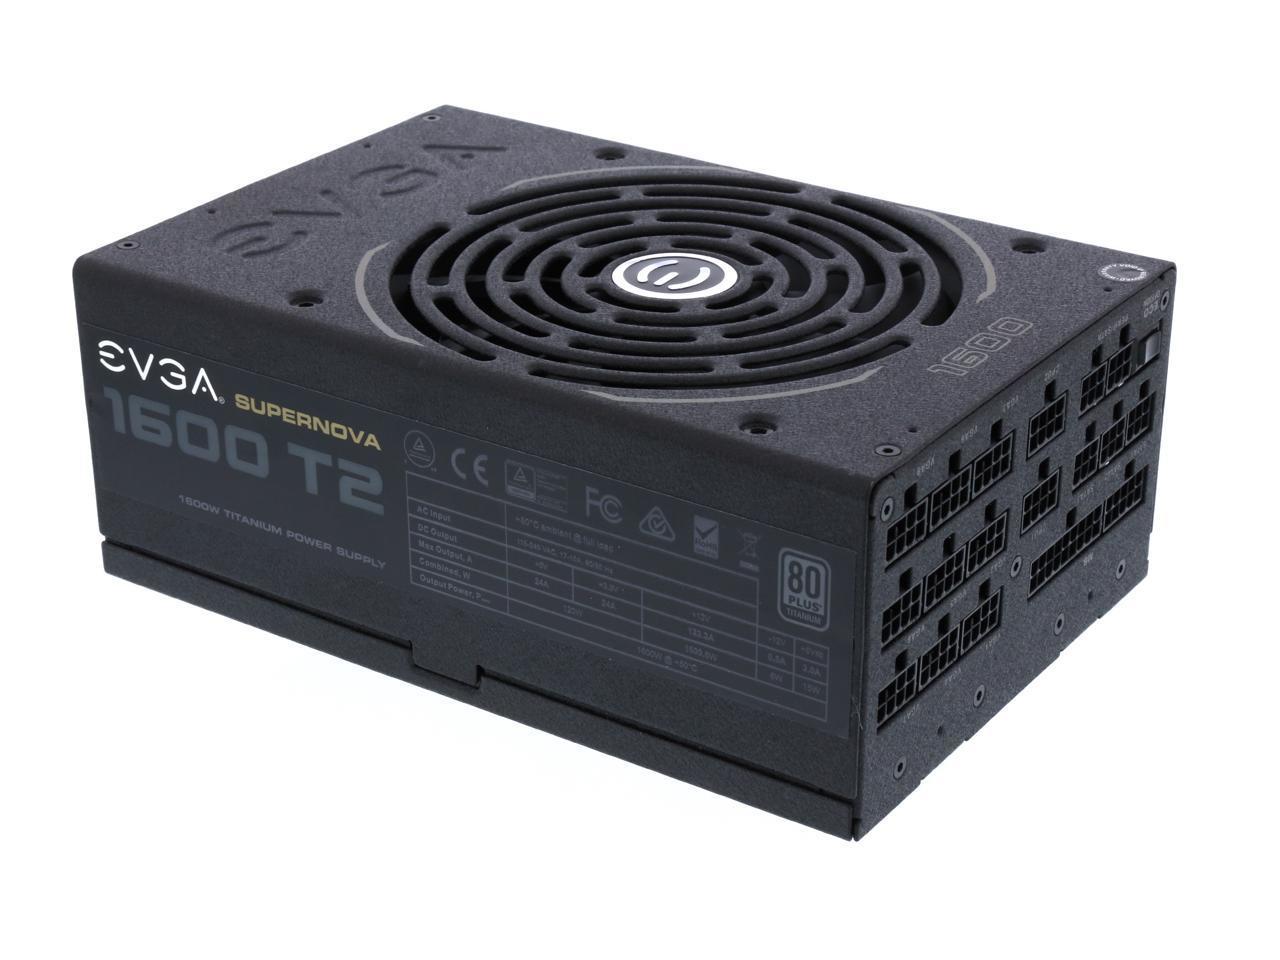 Evga Supernova 1600 T2 220 T2 1600 X1 80 Titanium 1600w Fully Modular Evga Eco Mode Includes Free Power On Self Tester Power Supply Newegg Com